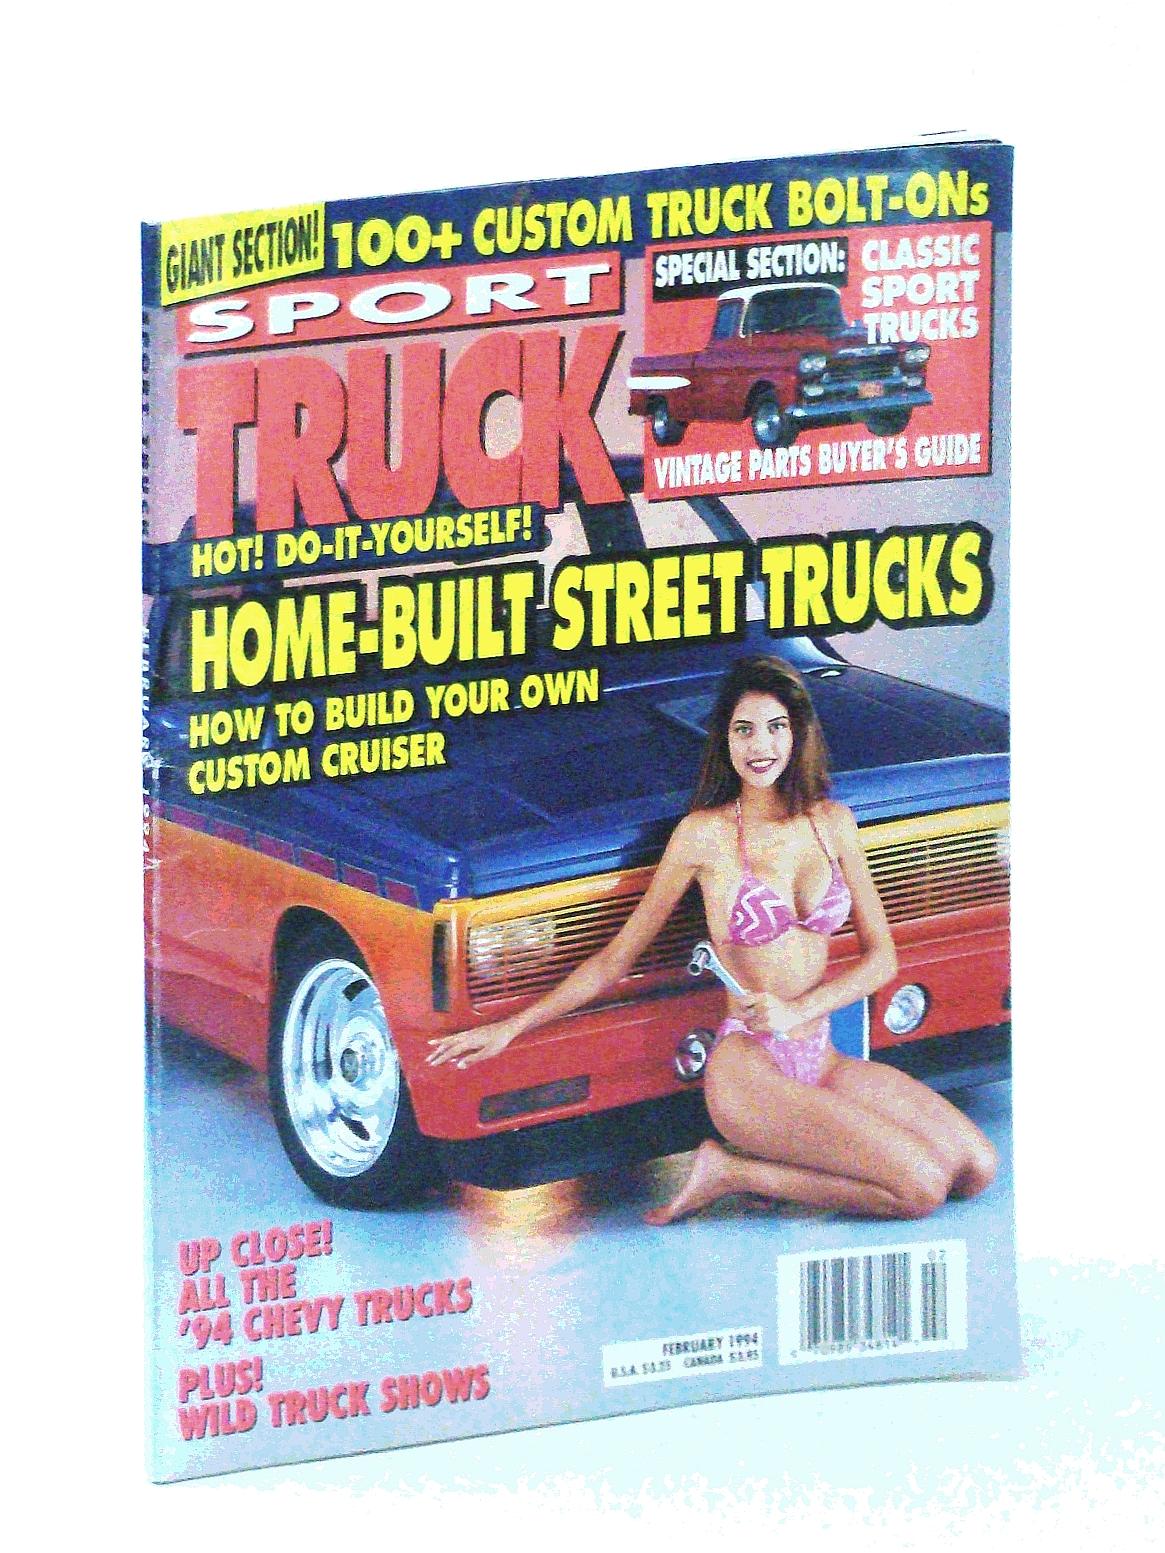 Image for Sport Truck Magazine, February [Feb.] 1994: Home-Built Street Trucks / Michelle Thomas Cover Photo